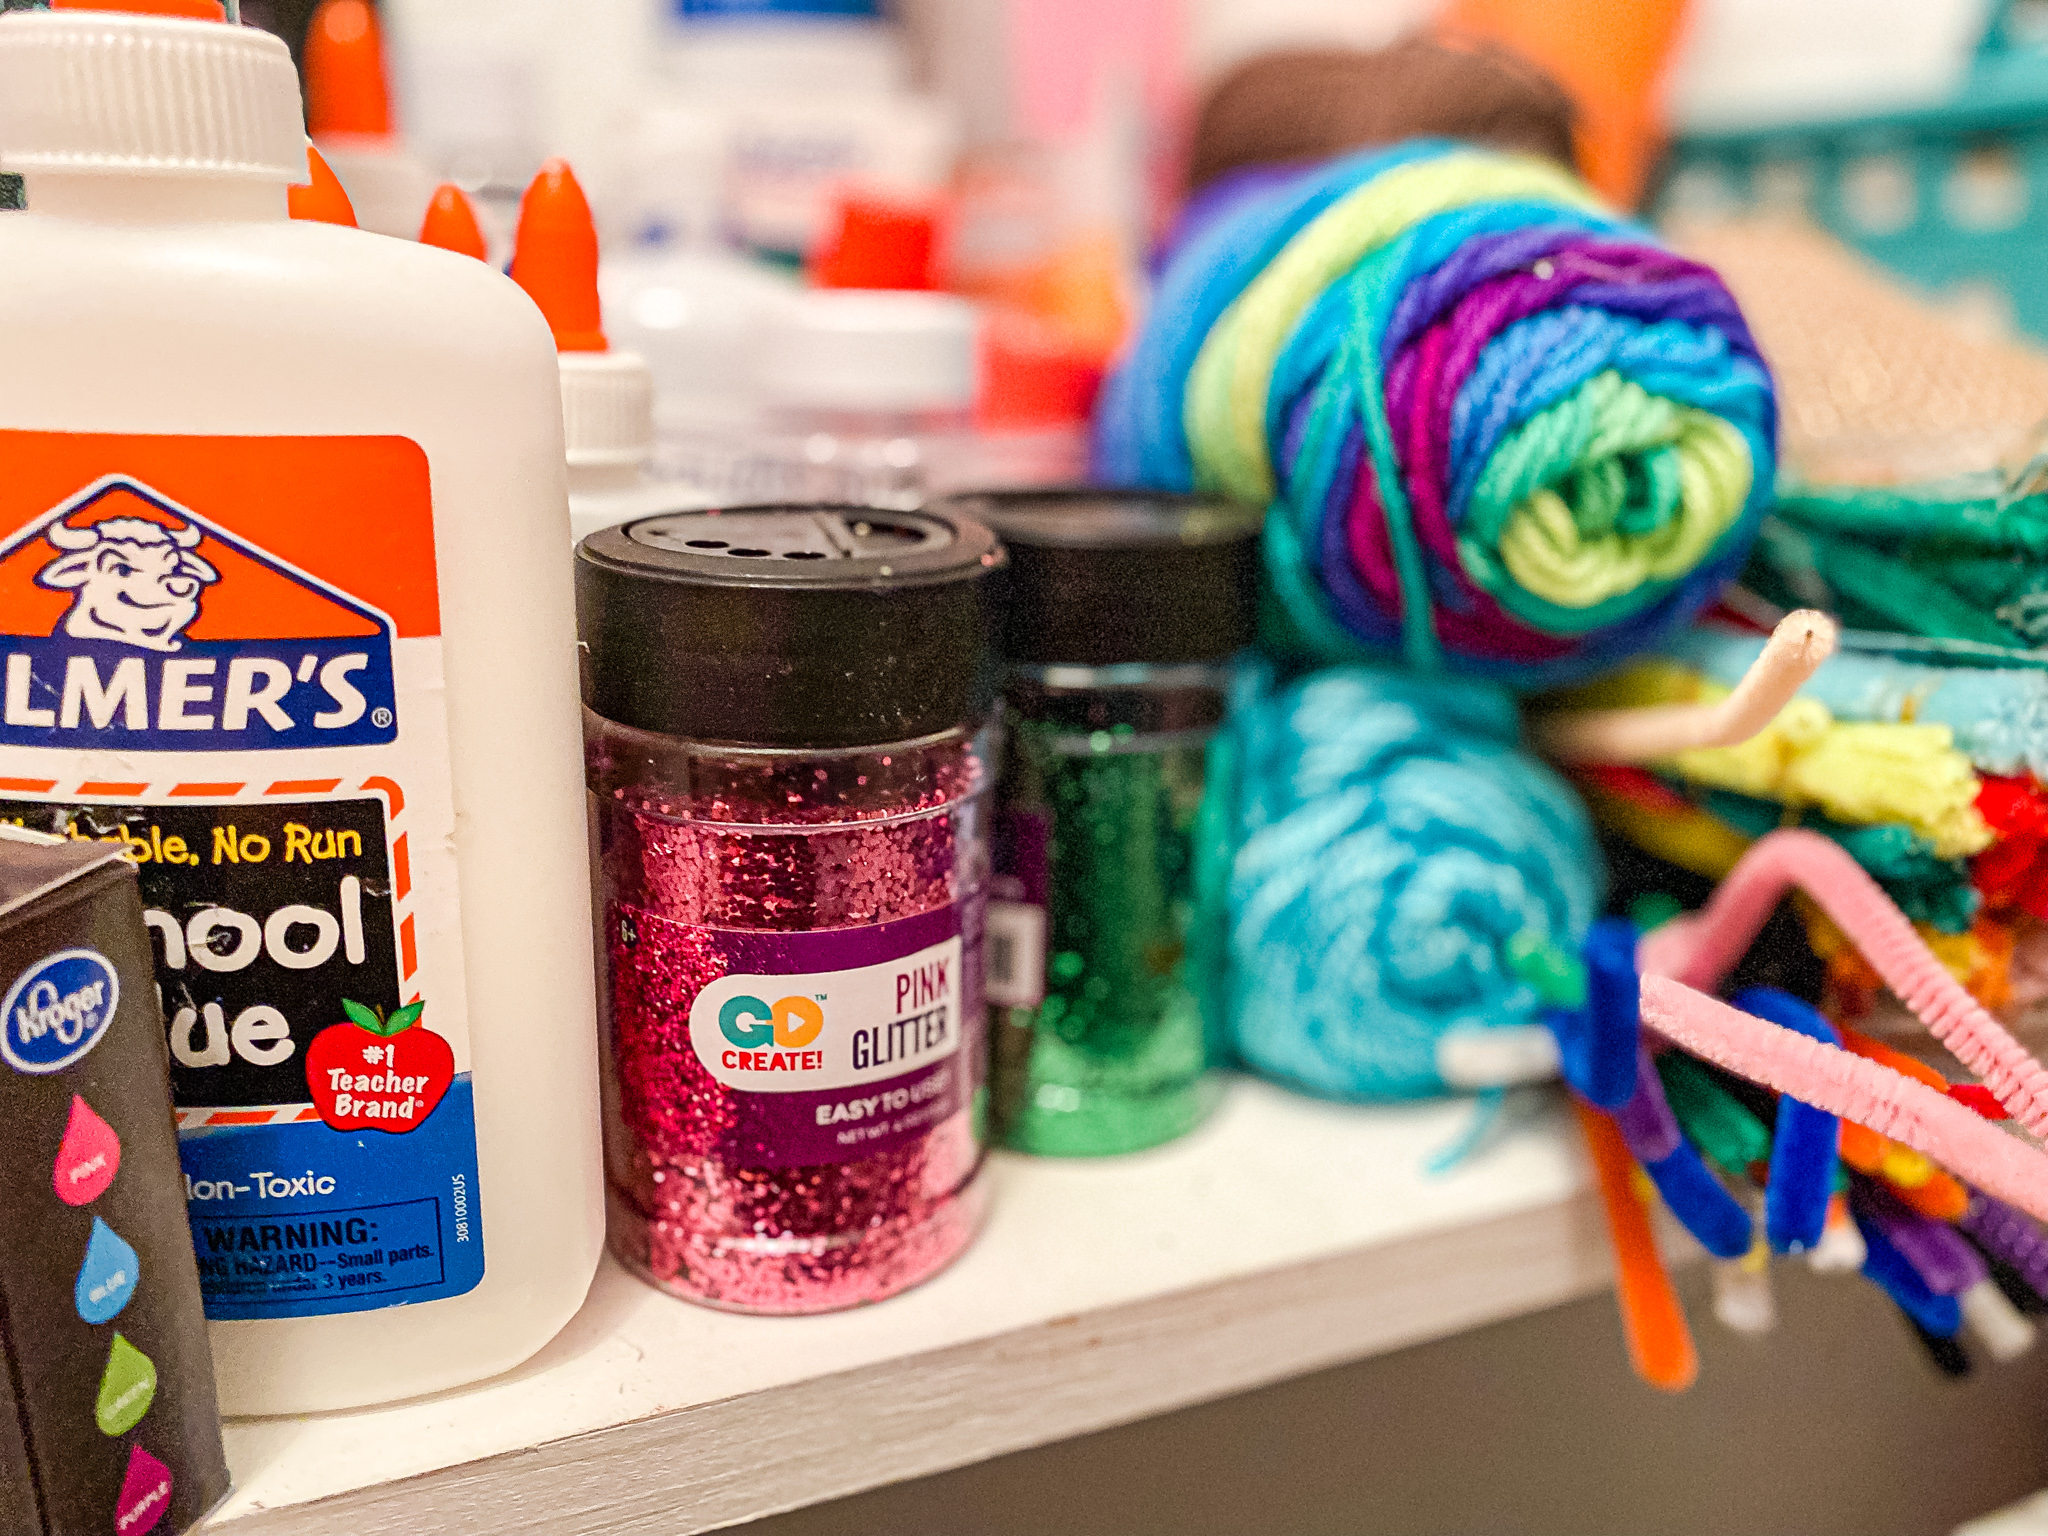 Homeschool Closet Materials Craft materials - glitter, yarn, glue